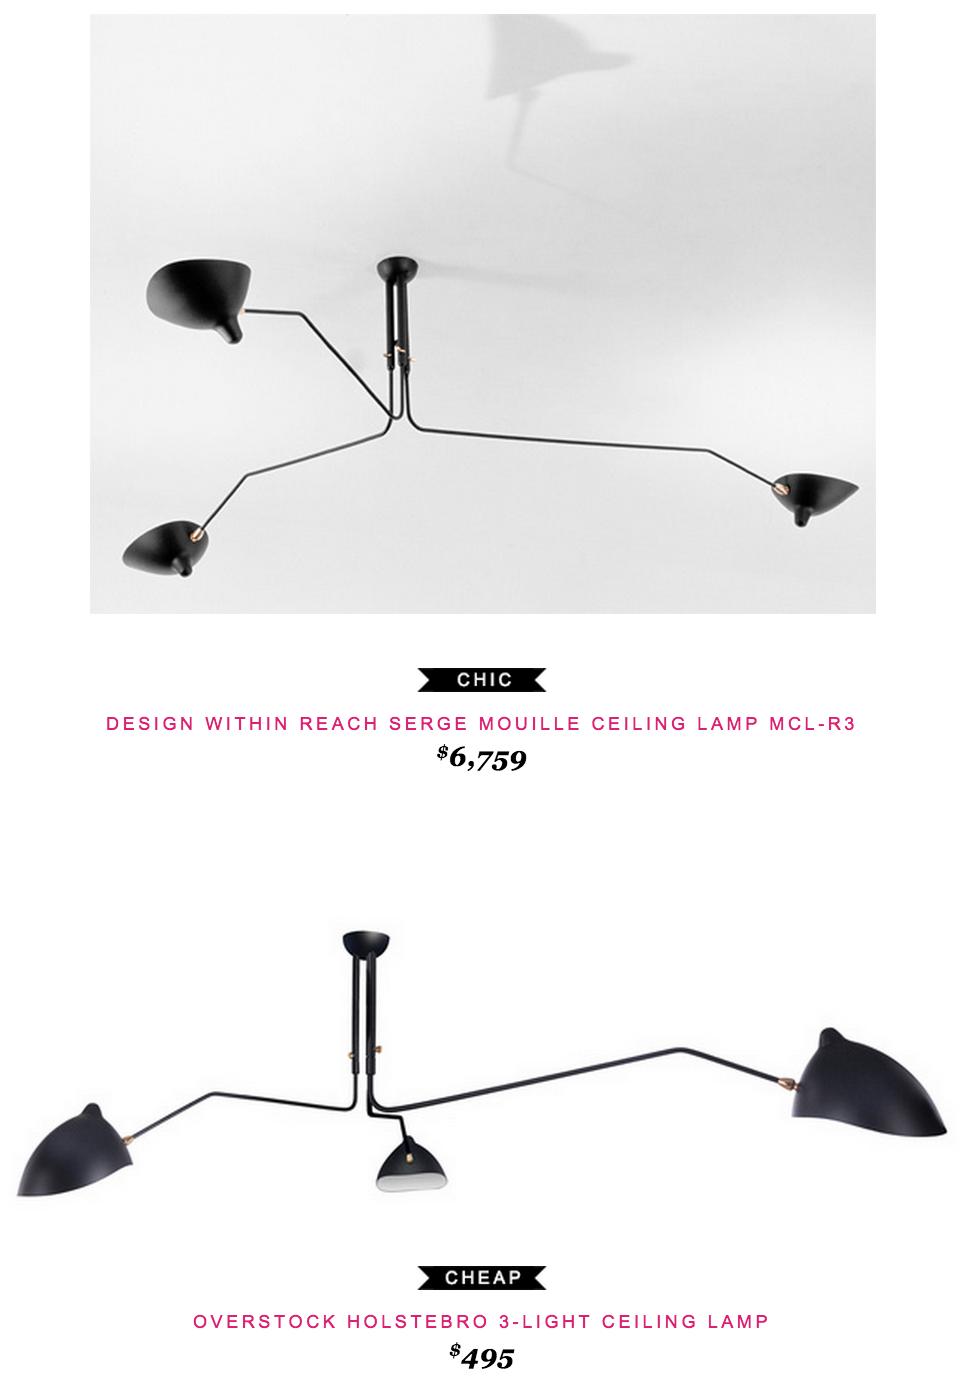 Serge mouille ceiling lamp mcl r3 part 2 6350 vs overstock serge mouille ceiling lamp mcl r3 part 2 6350 vs overstock holstebro 3 light arubaitofo Images